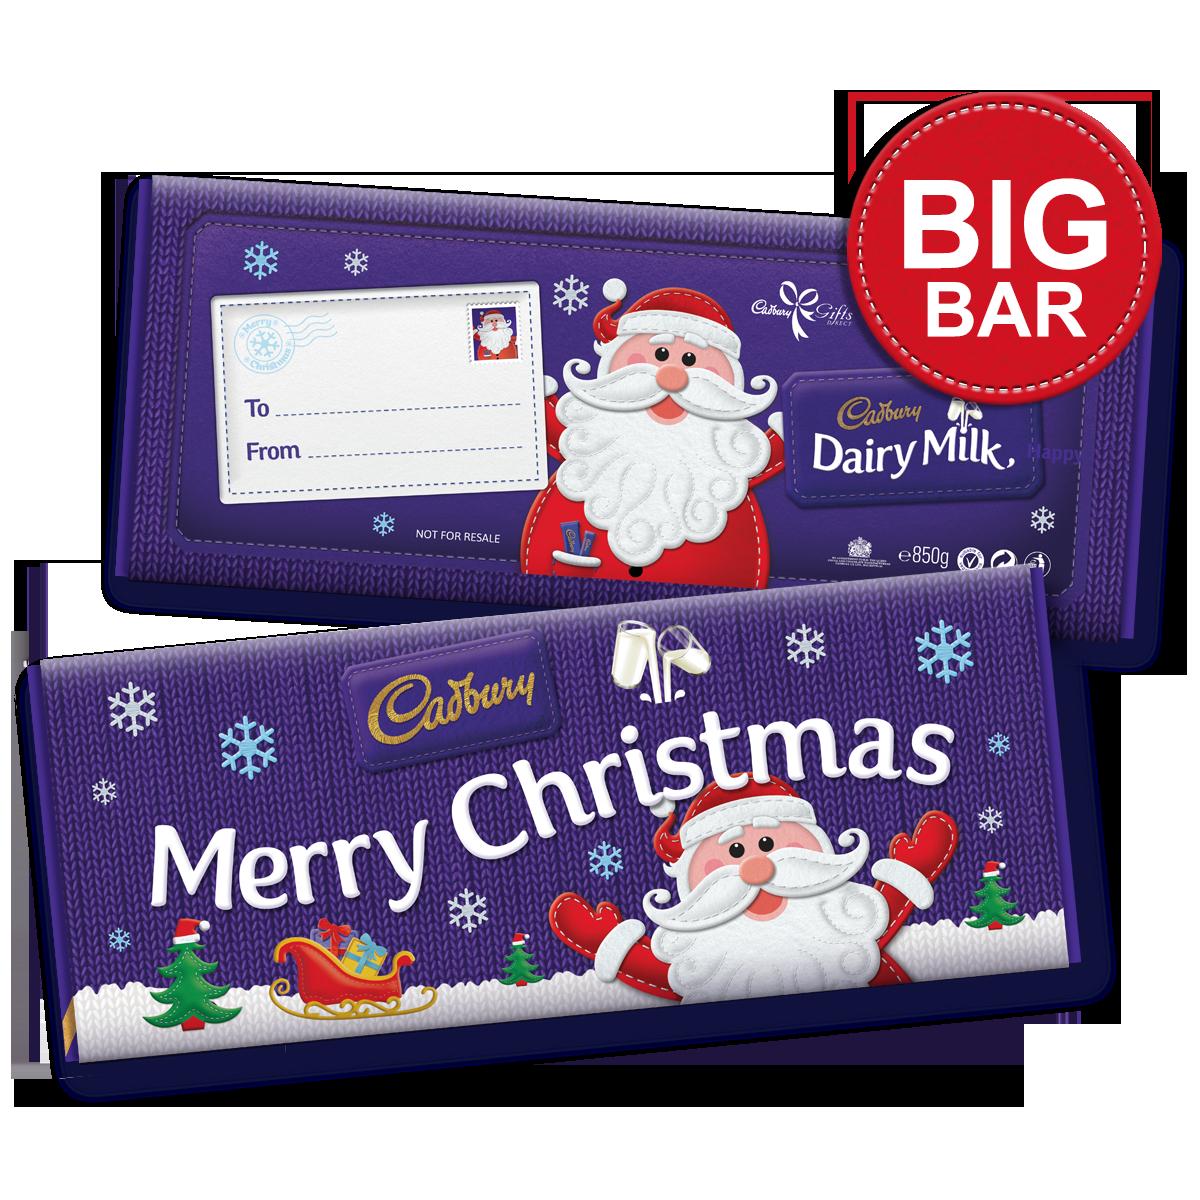 Dairy Milk Merry Christmas Bar | Cadbury gifts, Chocolate ...